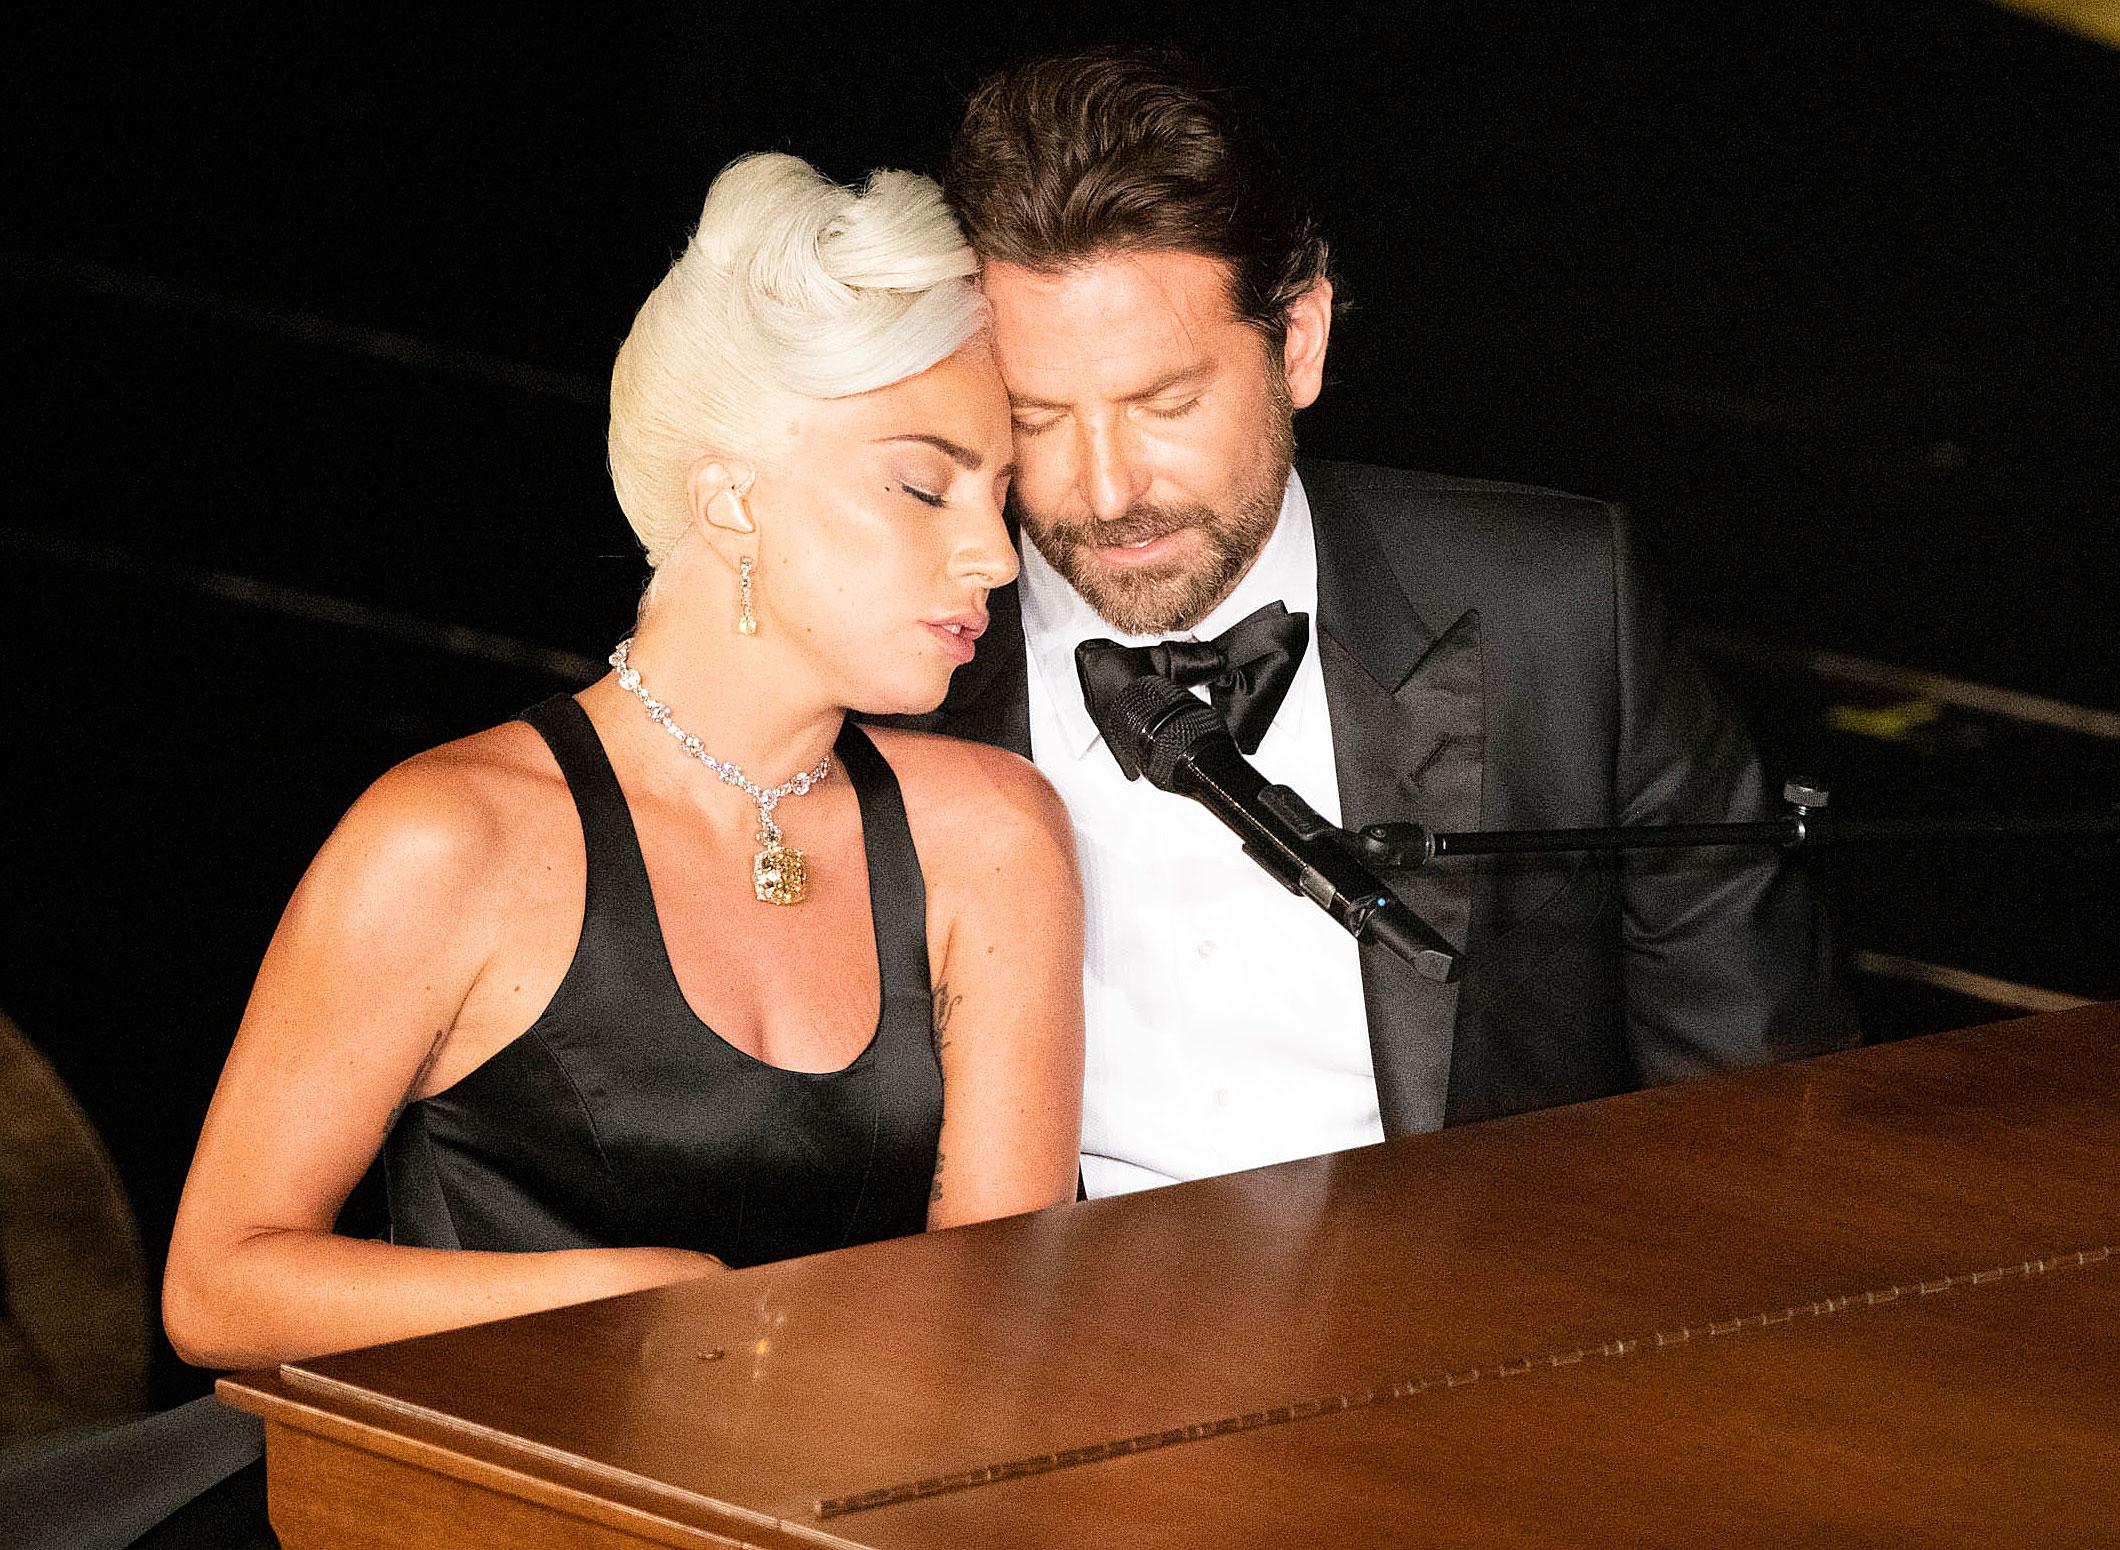 Bradley Cooper Lady Gaga Romance Rumors